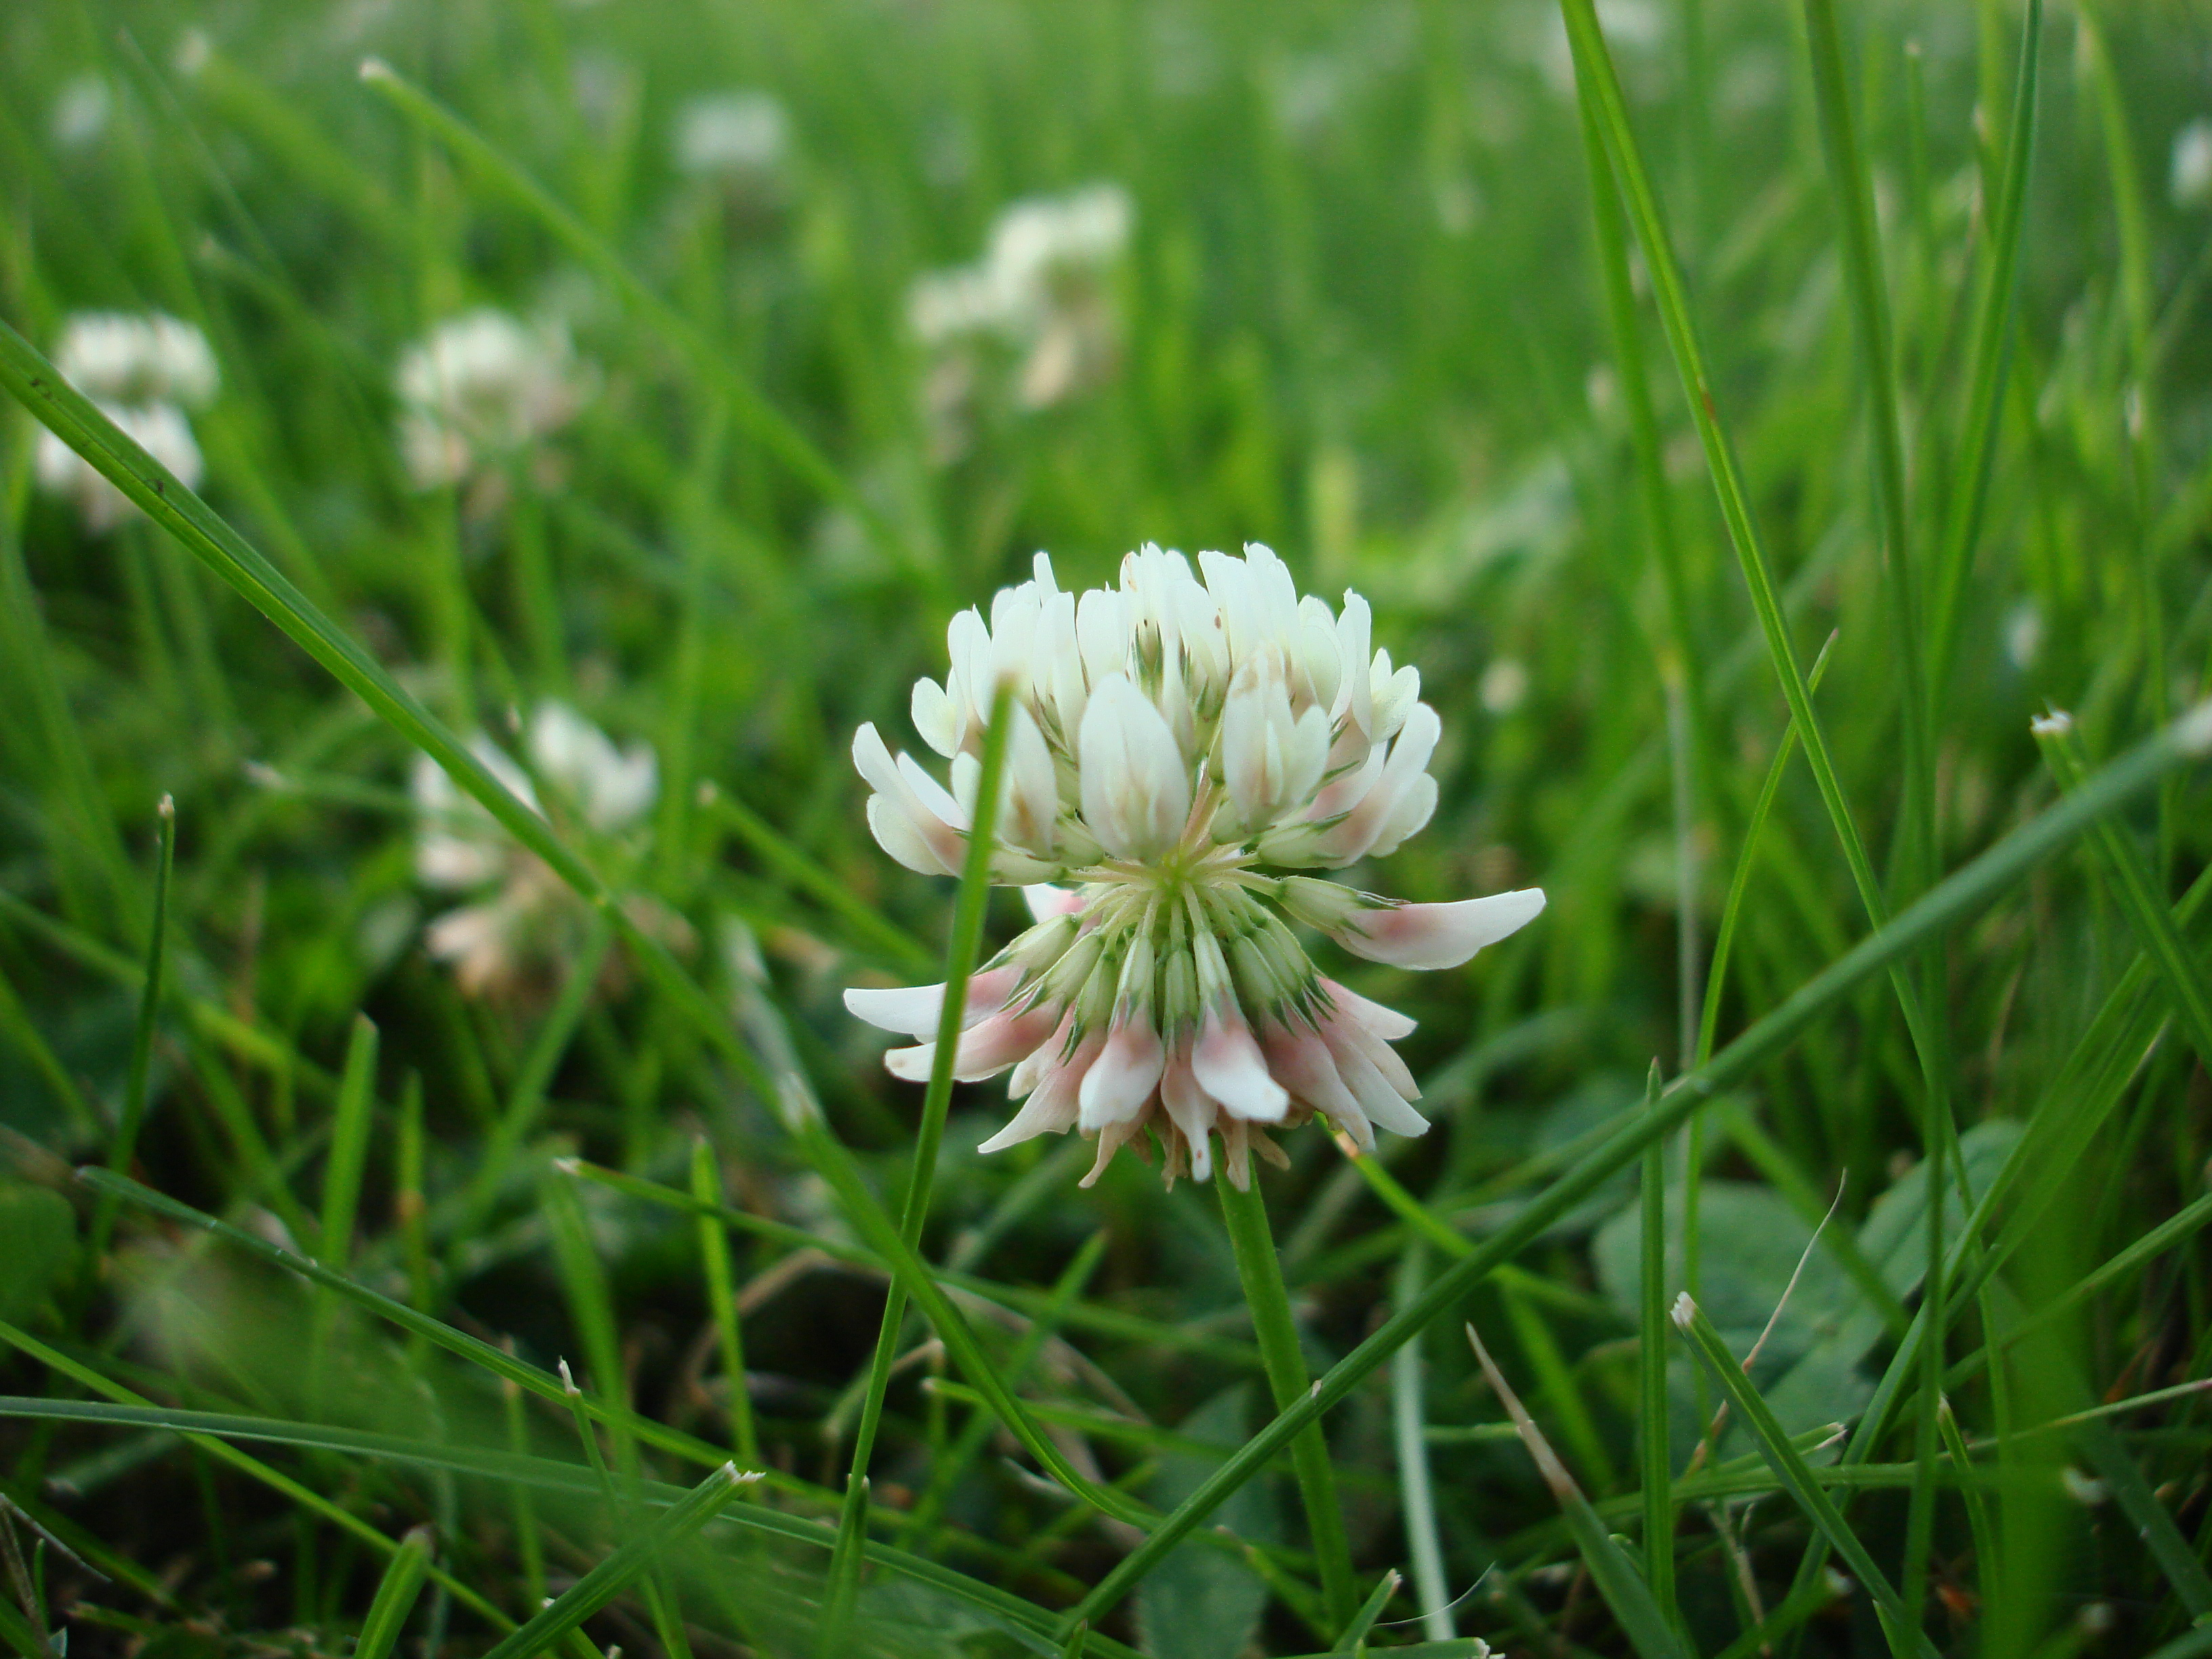 top image credit - Types Of Weeds